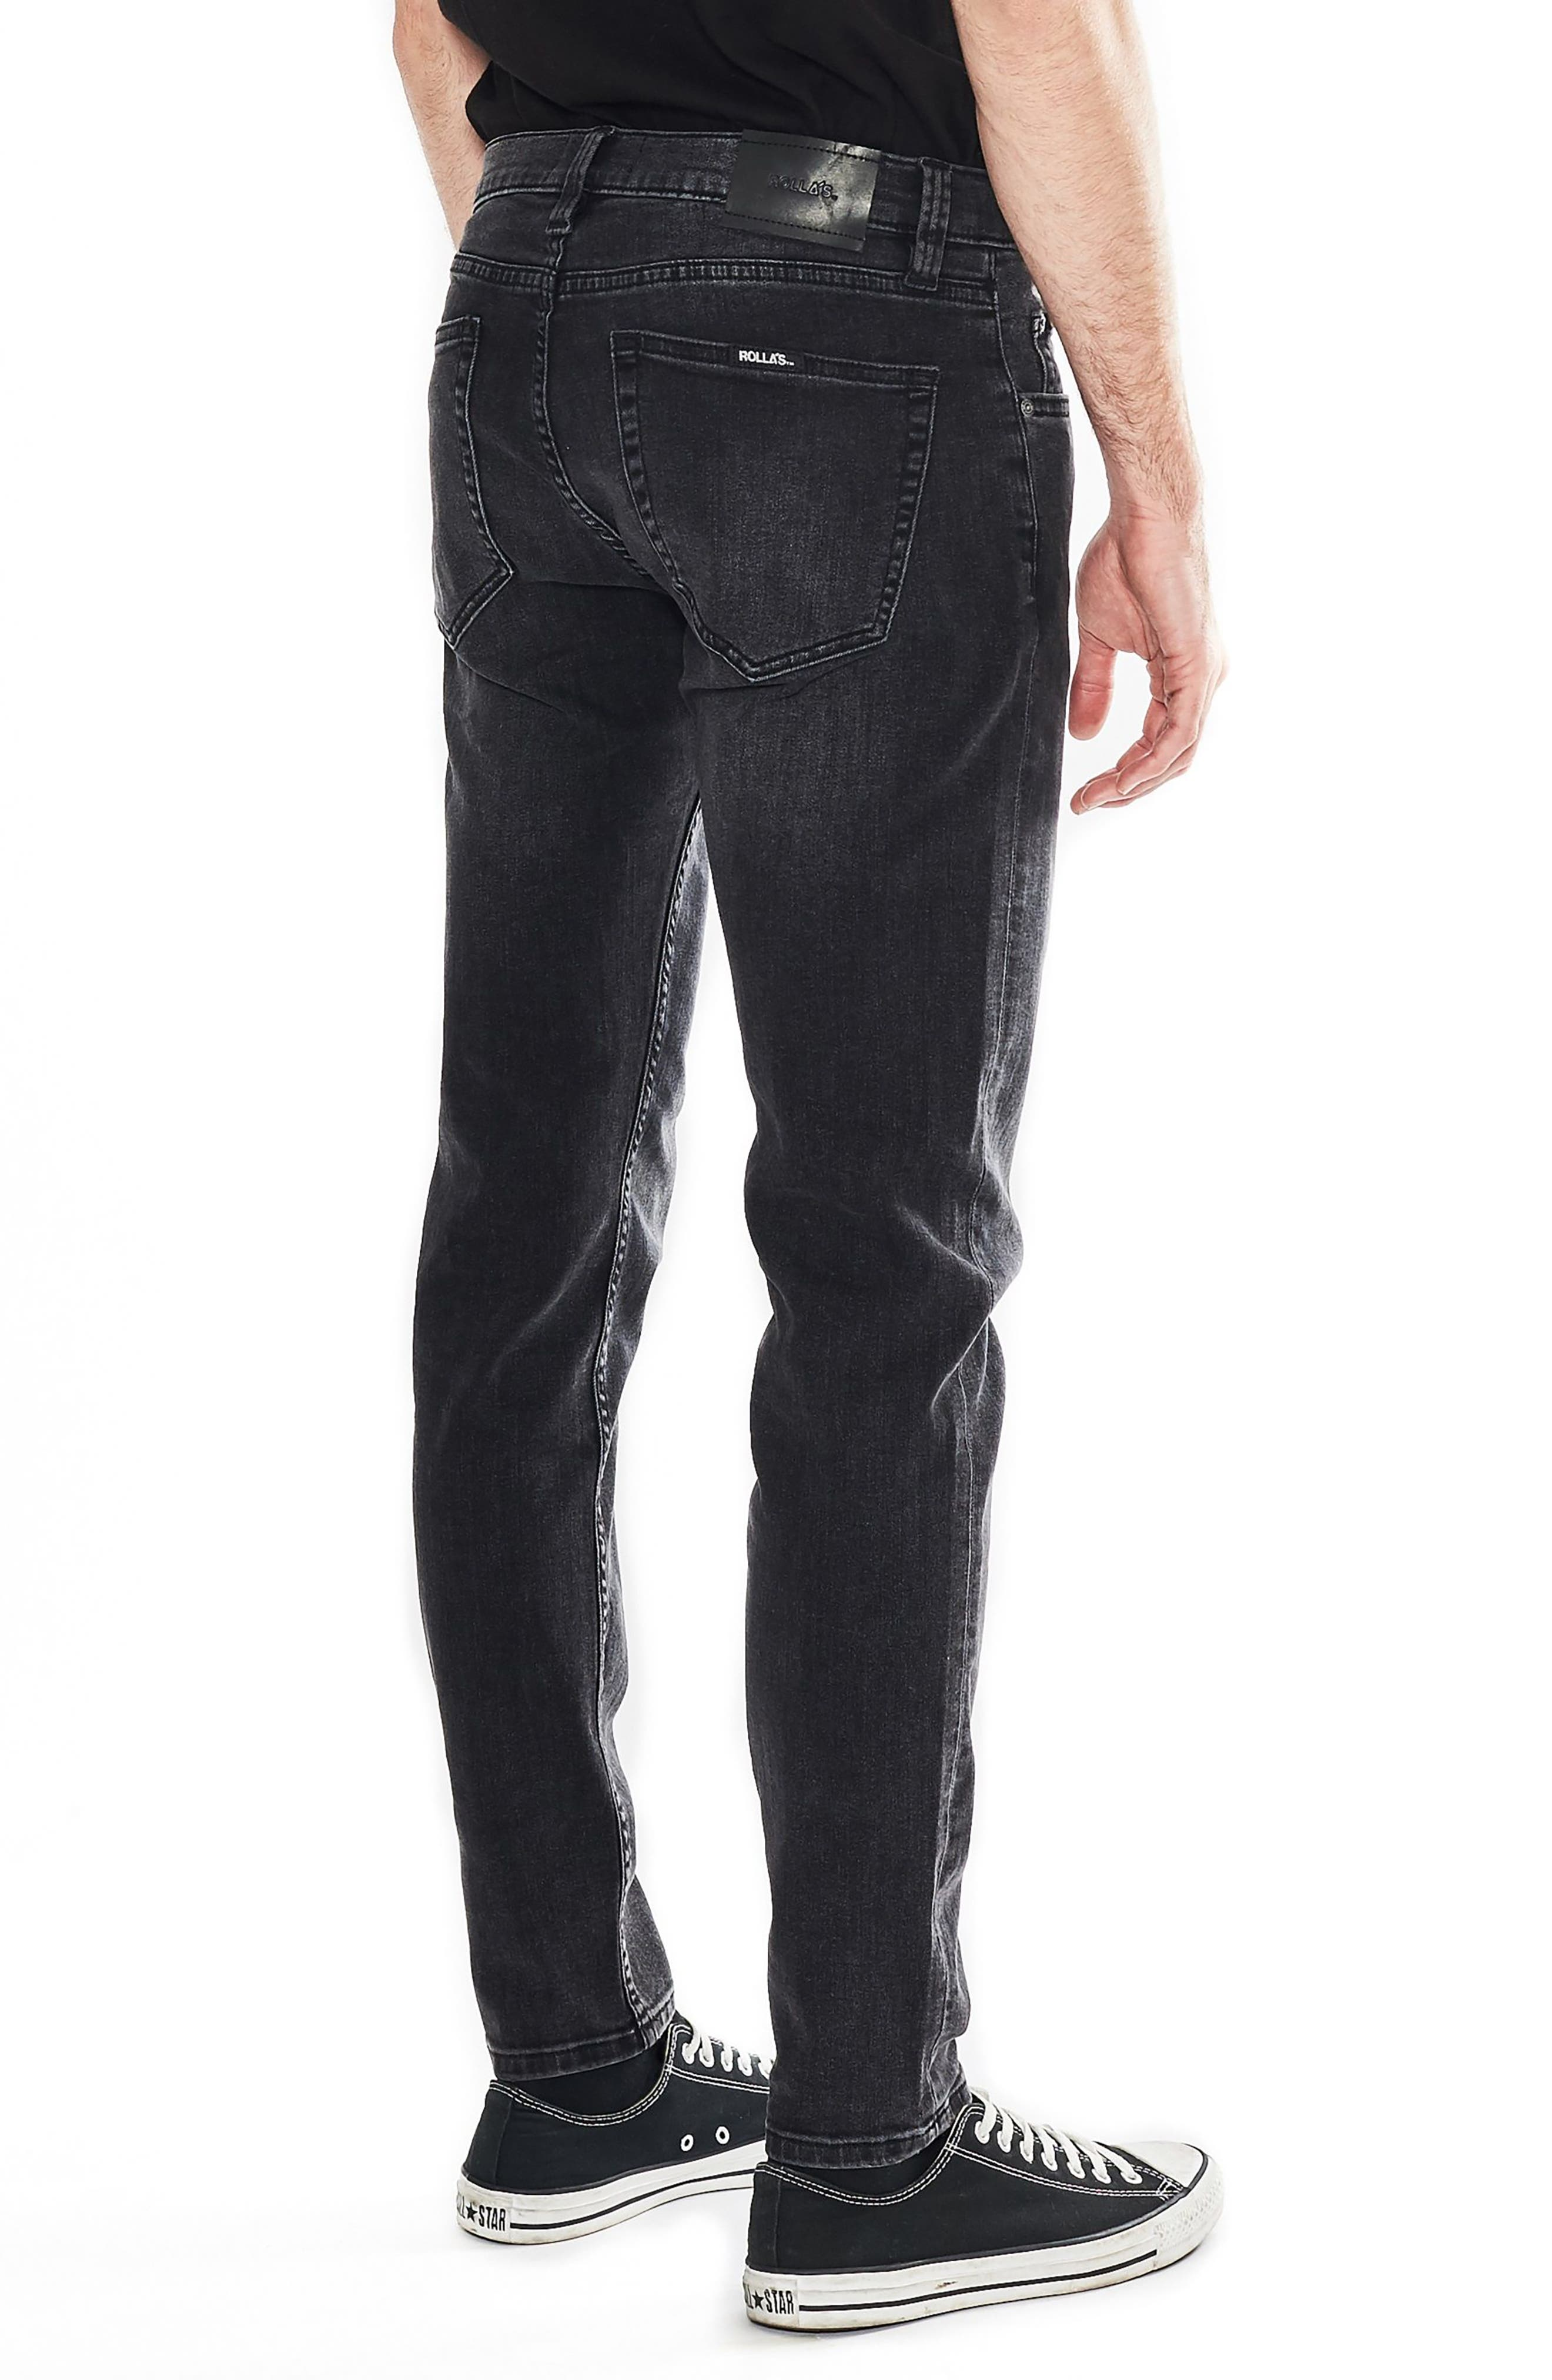 Stinger Skinny Fit Jeans,                             Alternate thumbnail 4, color,                             OLD GOLD